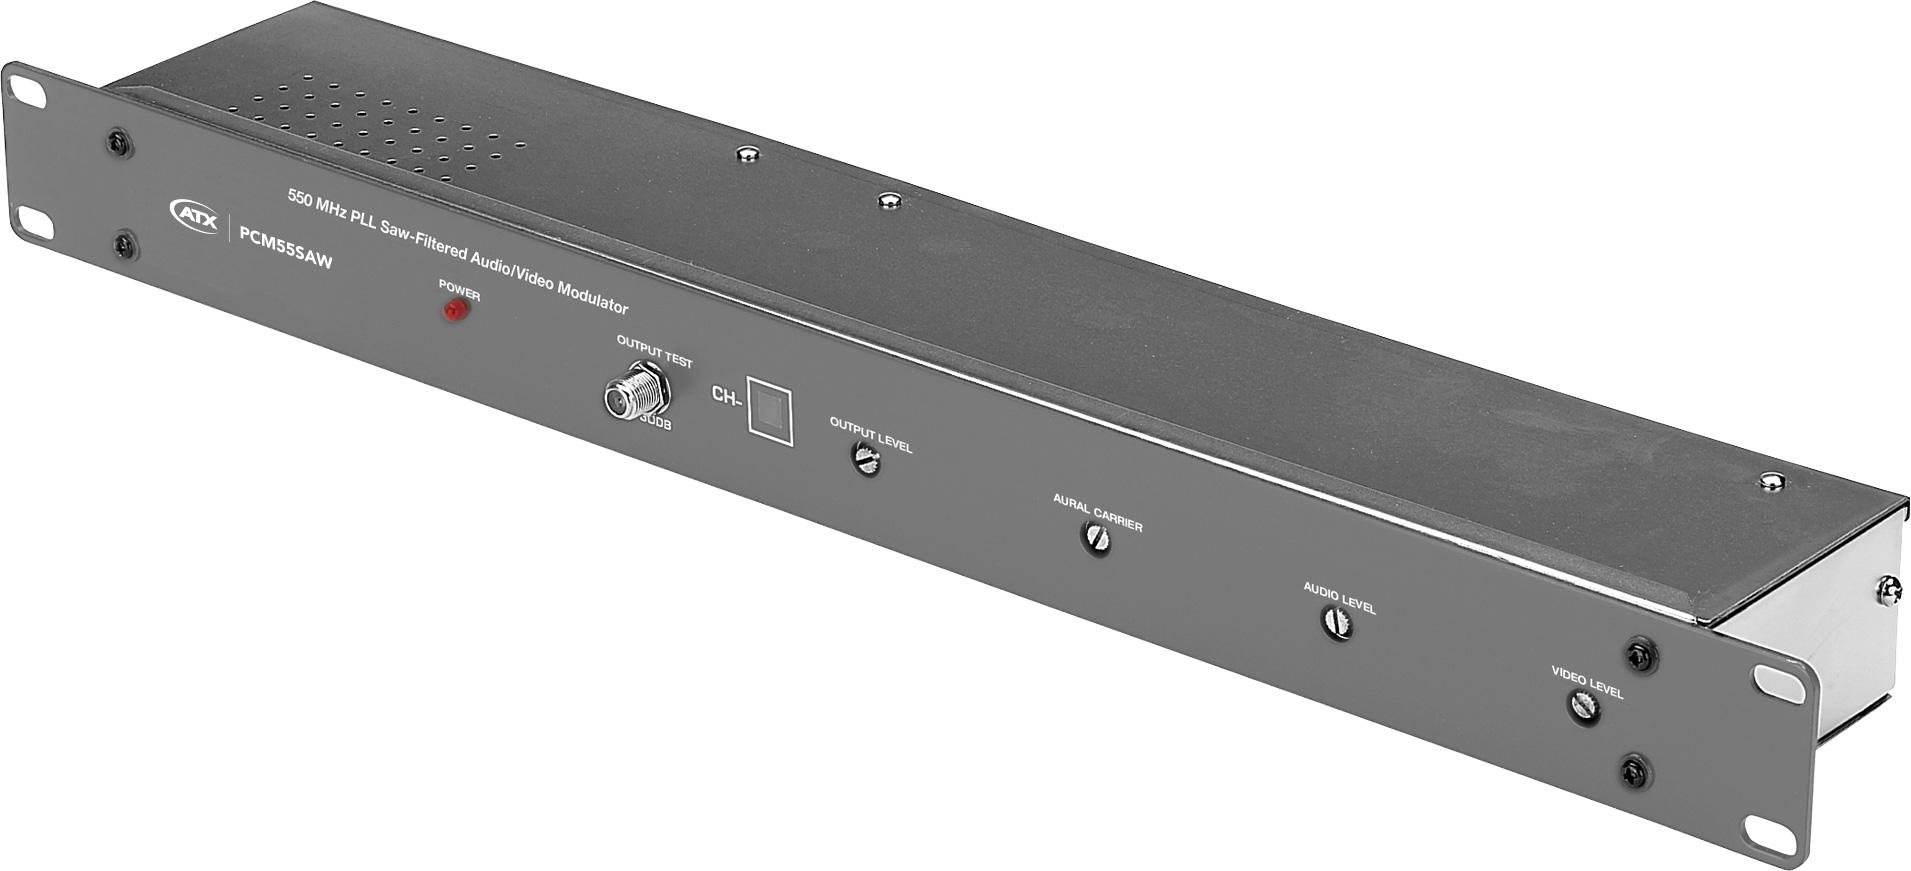 1 Channel Crystal A/V Modulator - Channel 97 PM-PCM55SAW-97